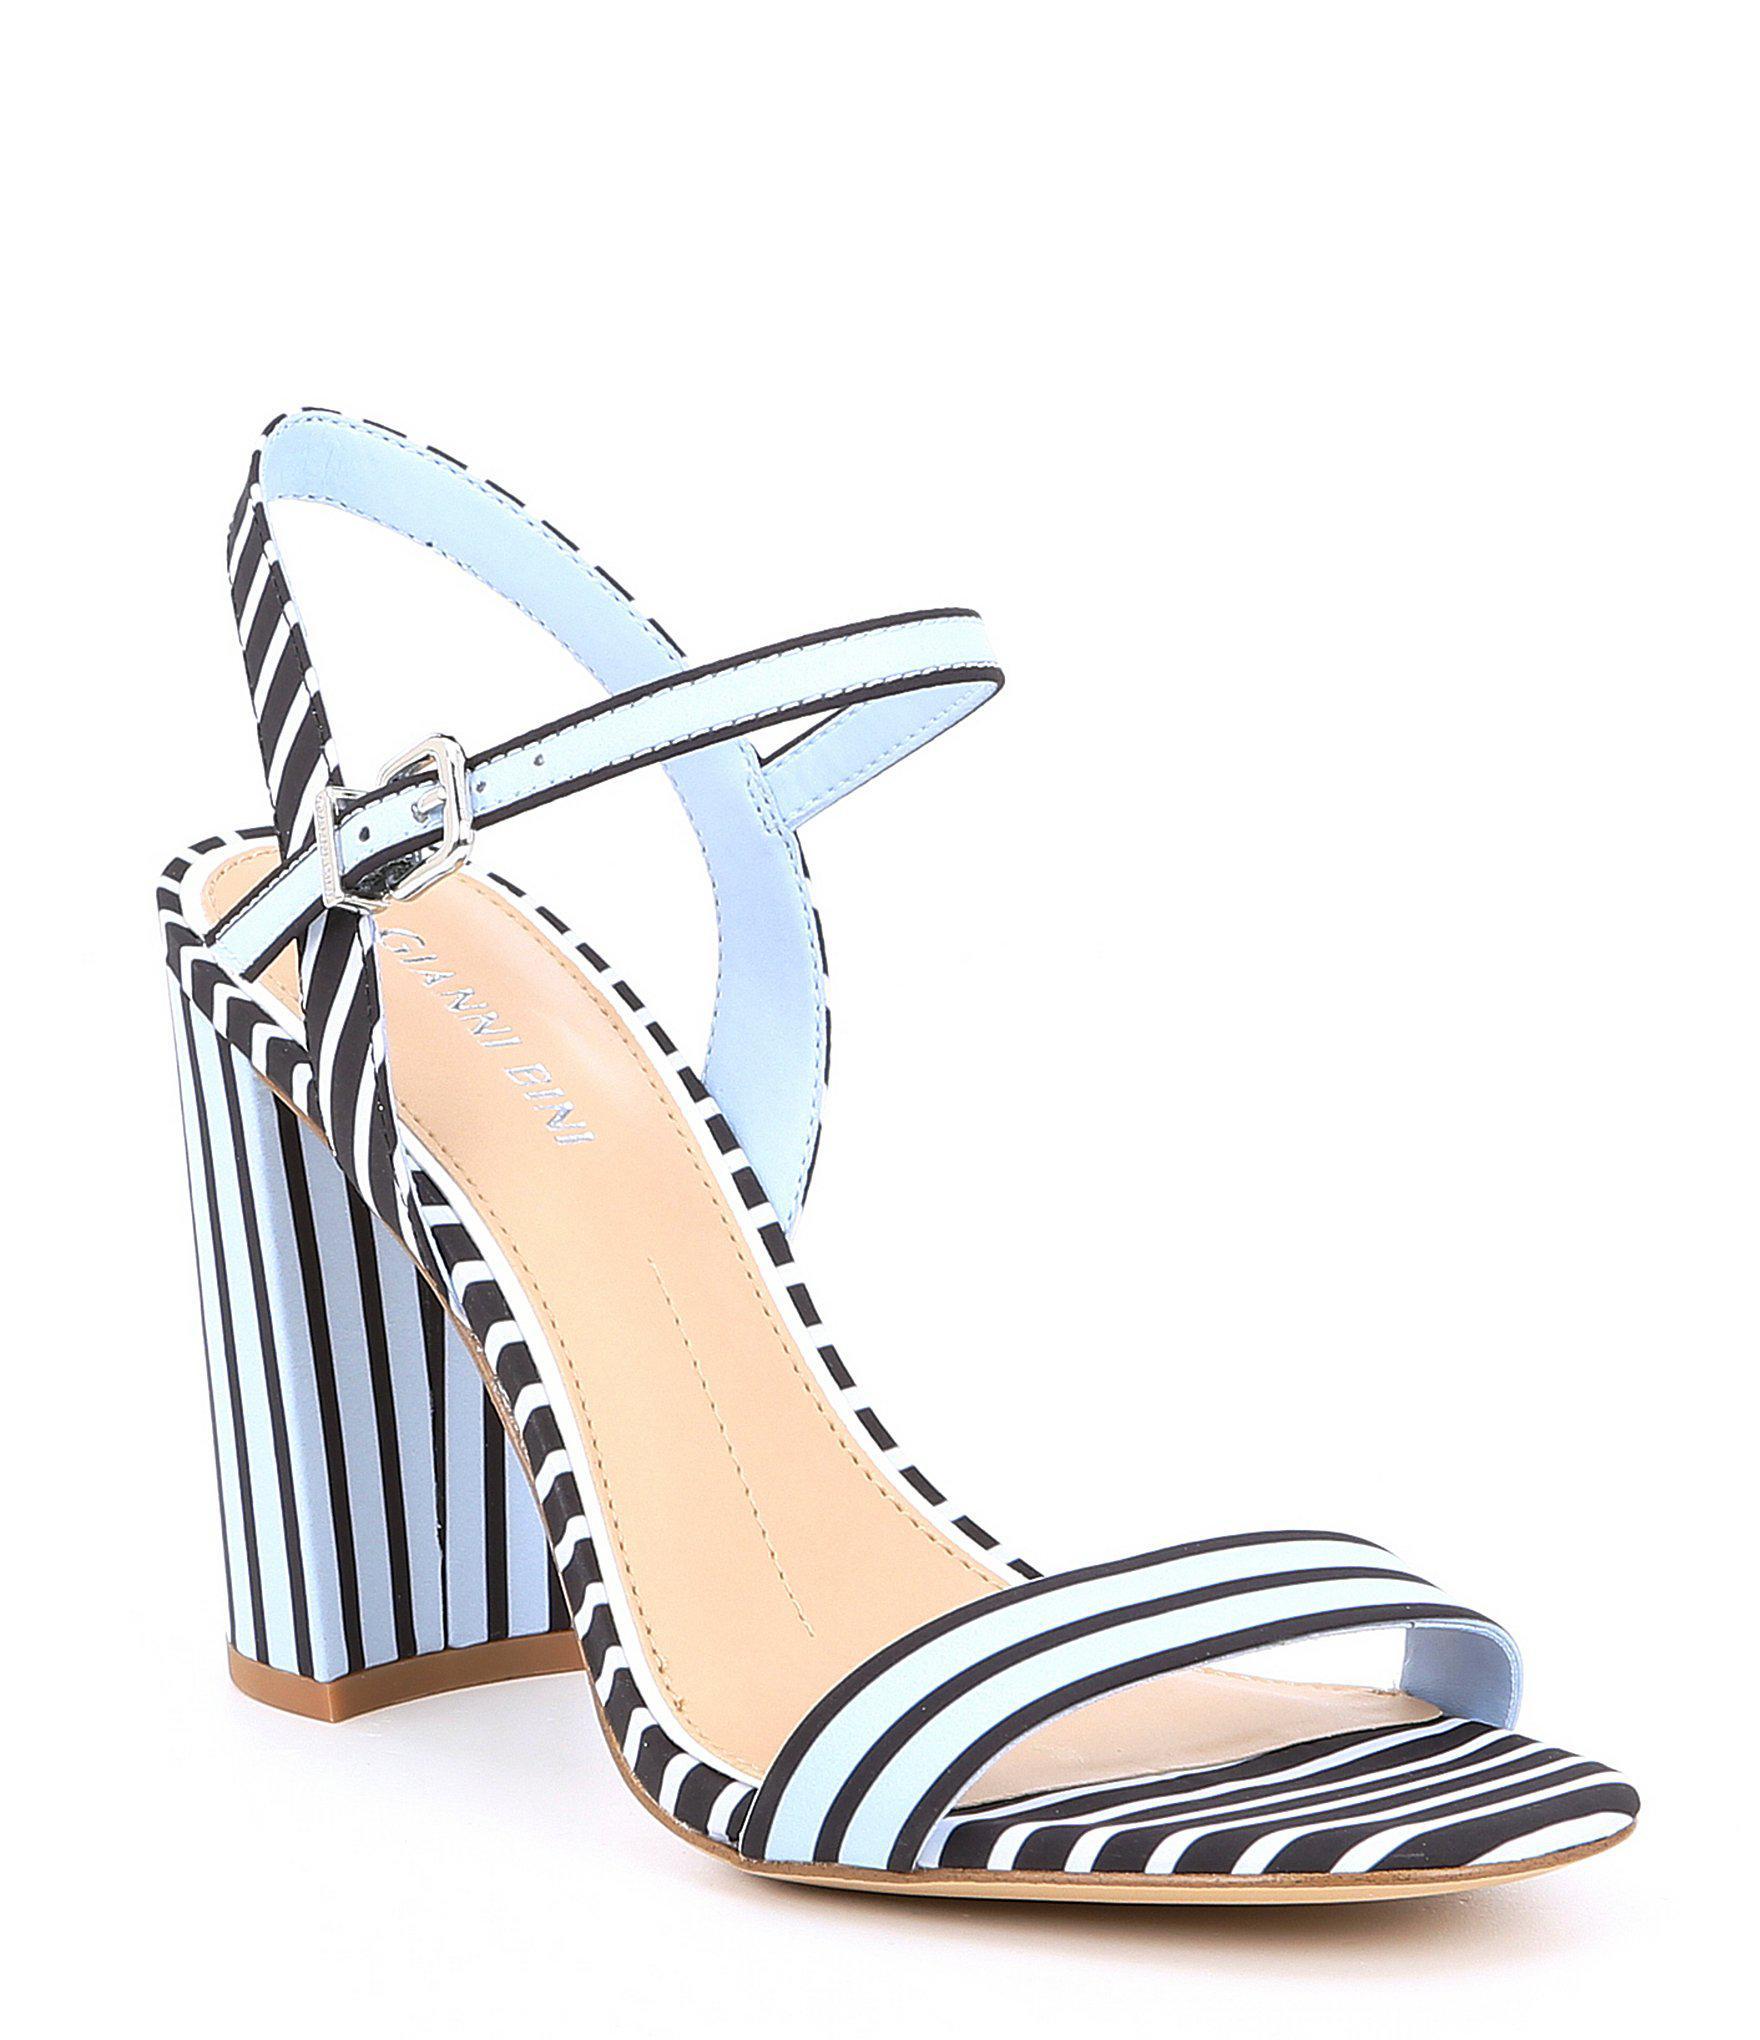 443f2fada33 Lyst - Gianni Bini Mckaria Stripe Block Heel Sandals in Blue